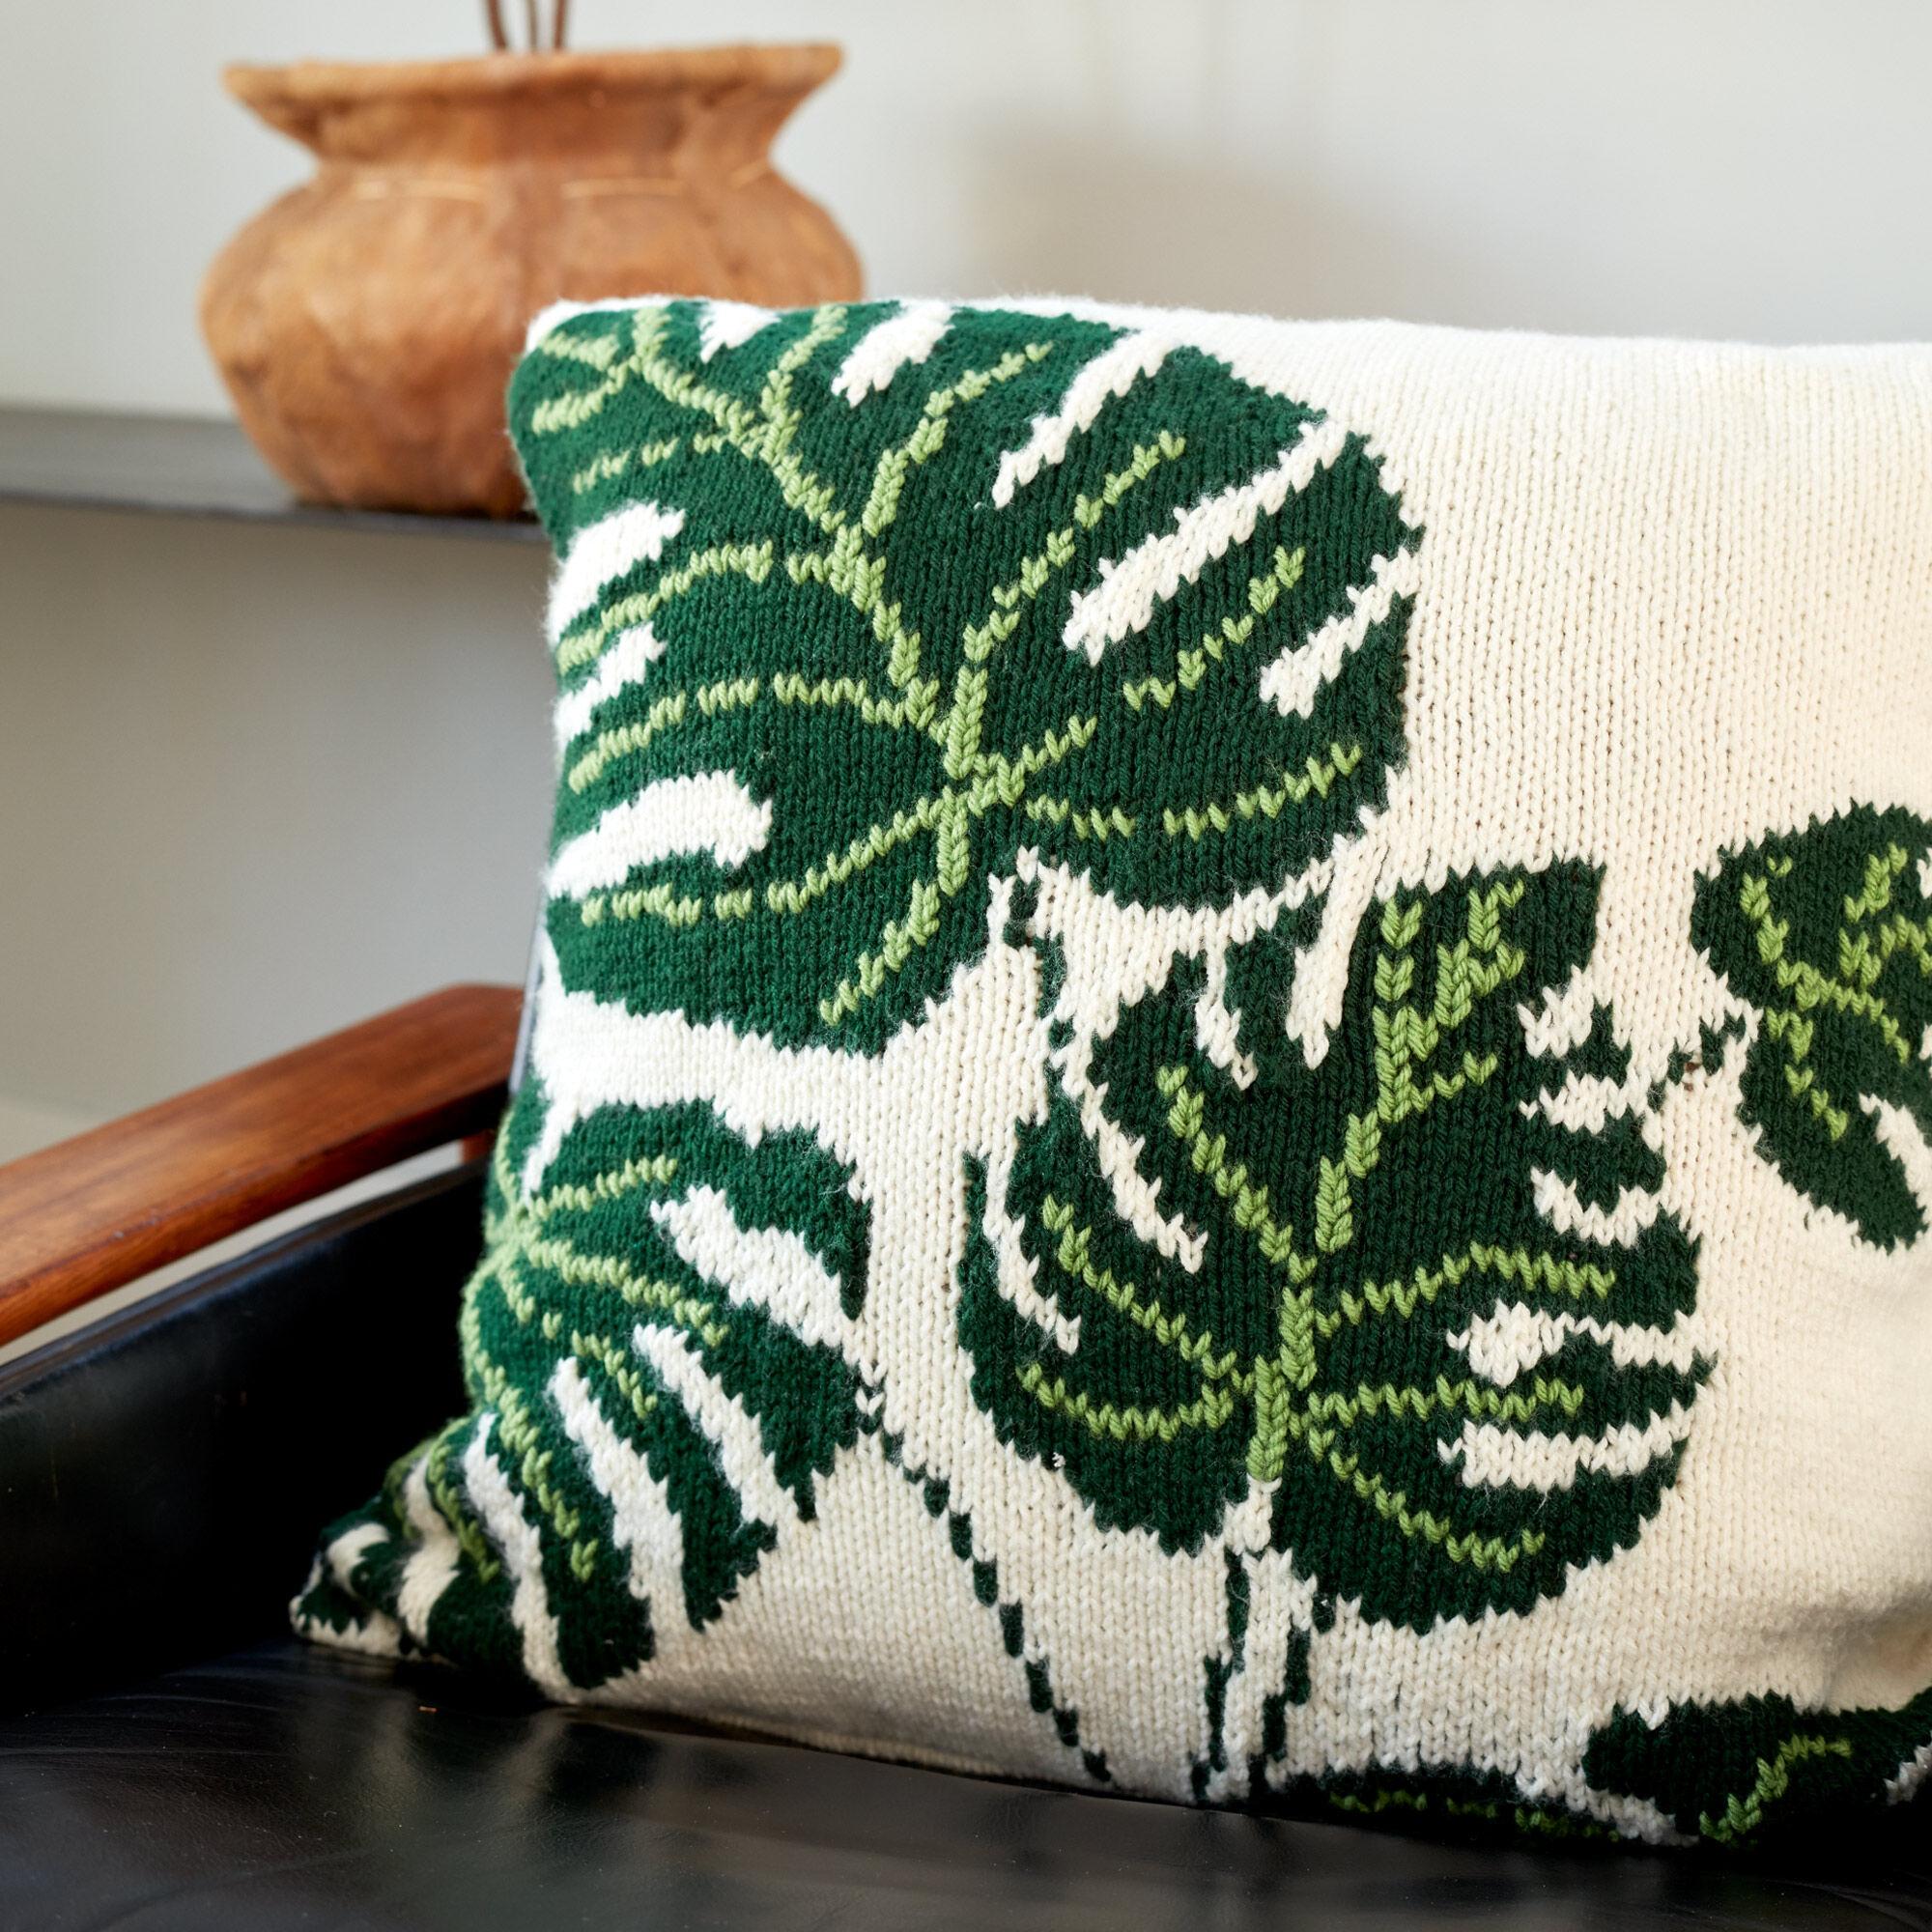 Bernat Tropical Leaf Knit Pillow Pattern | Yarnspirations